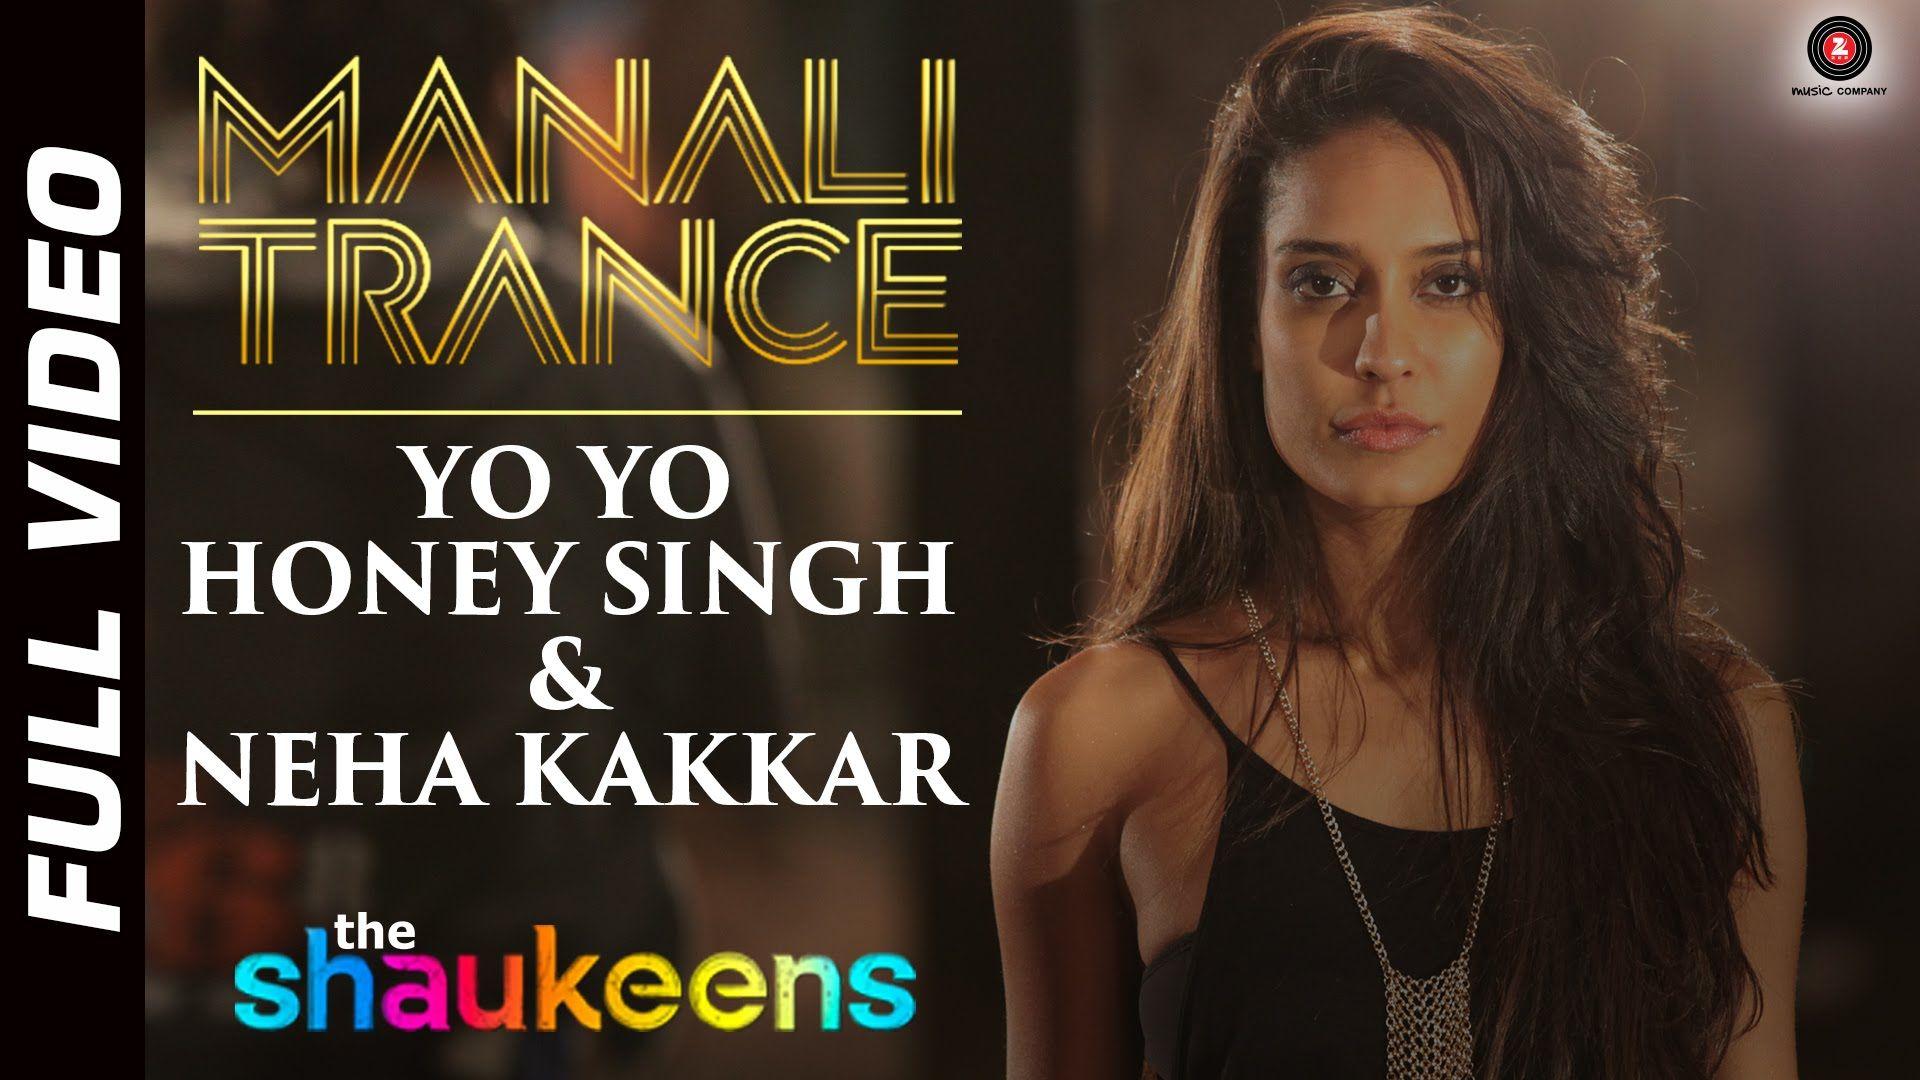 Manali Trance Full Video Yo Yo Honey Singh Neha Kakkar The Shaukeens Lisa Haydon Yo Yo Honey Singh Neha Kakkar The Shaukeens